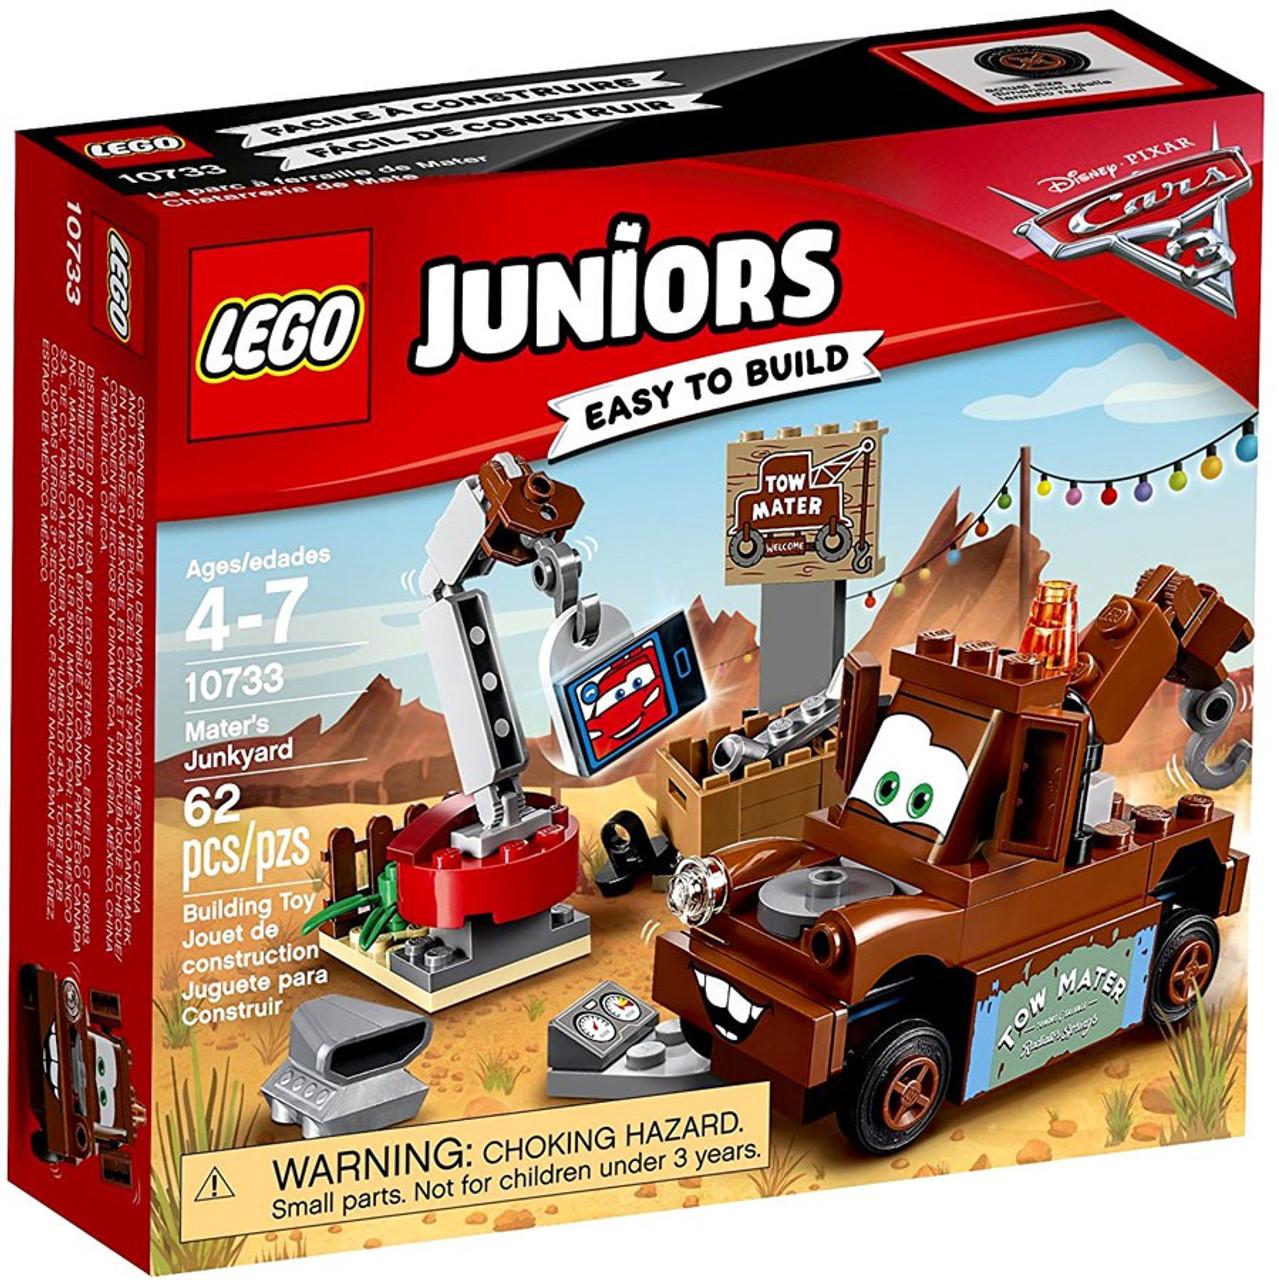 Lego Disney Pixar Cars 3 Juniors Maters Junk Yark Set 10733 Spy Jet Escape 8638 Toywiz